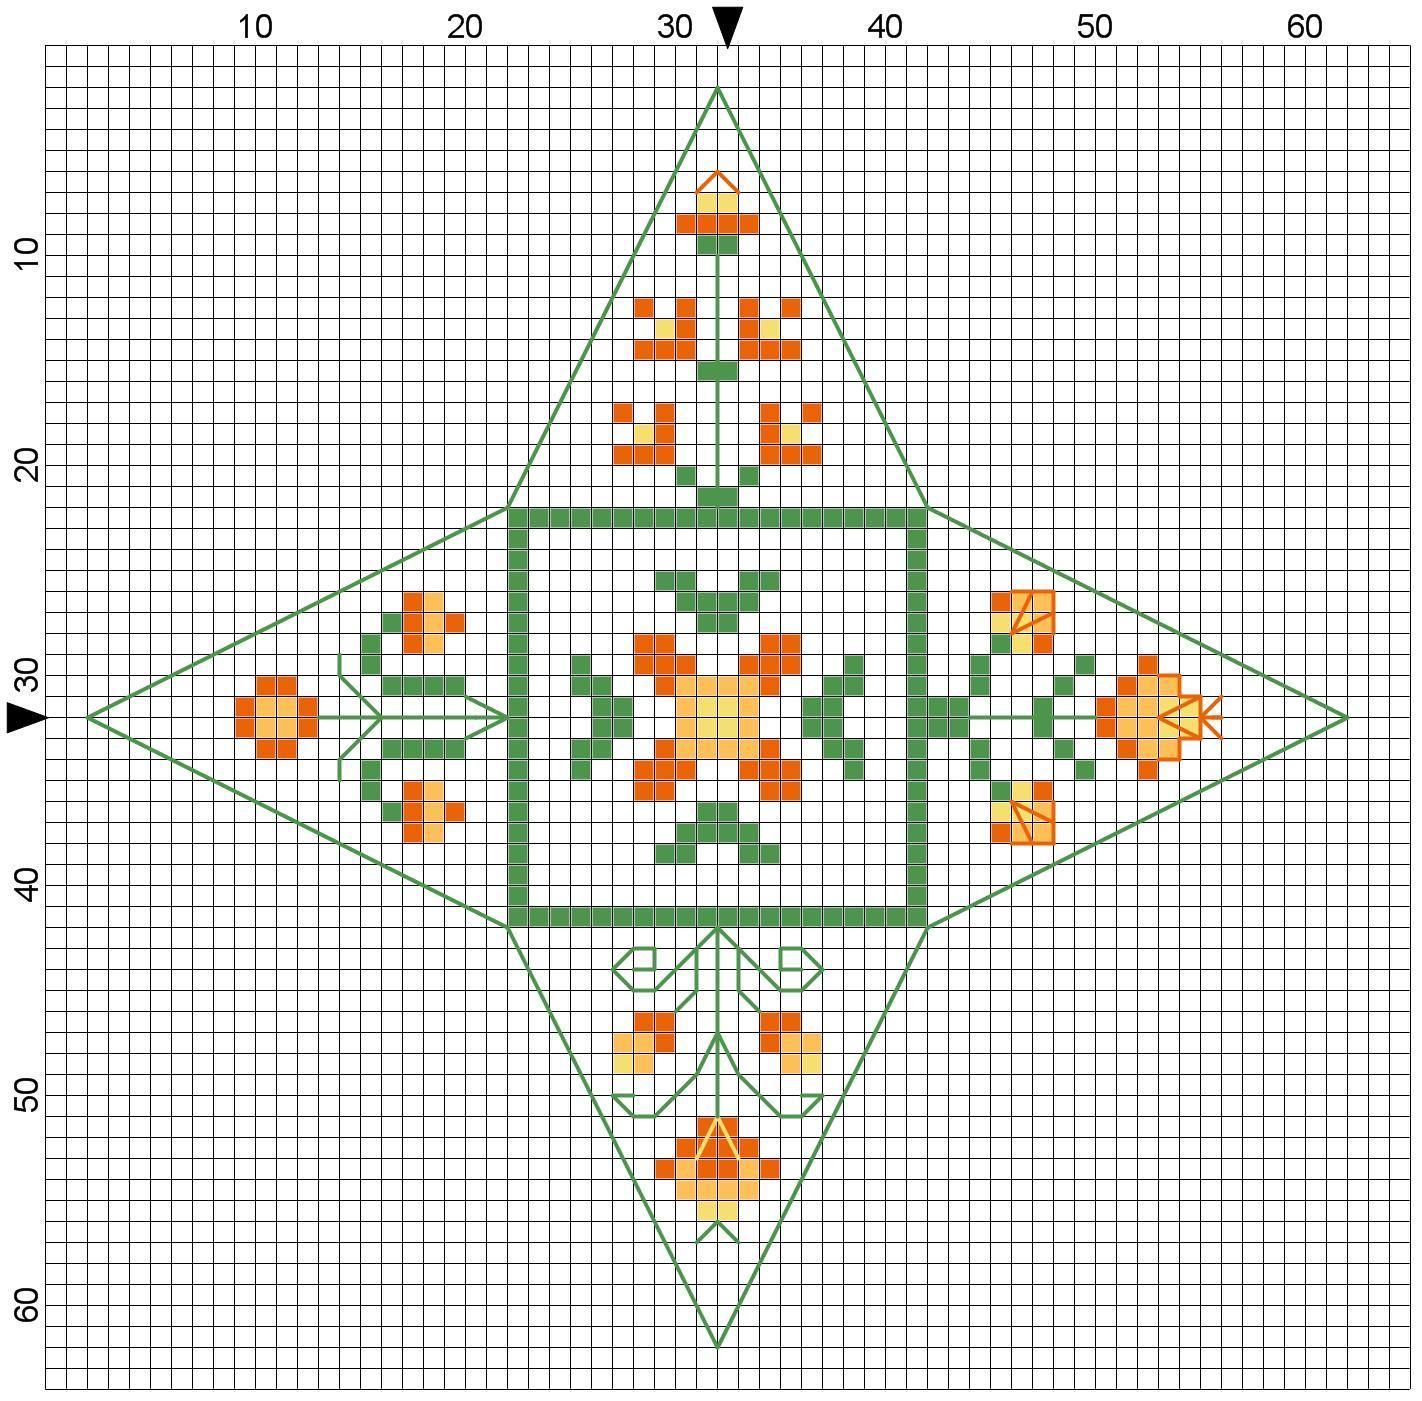 narancs_piramis.jpg (1422×1401)